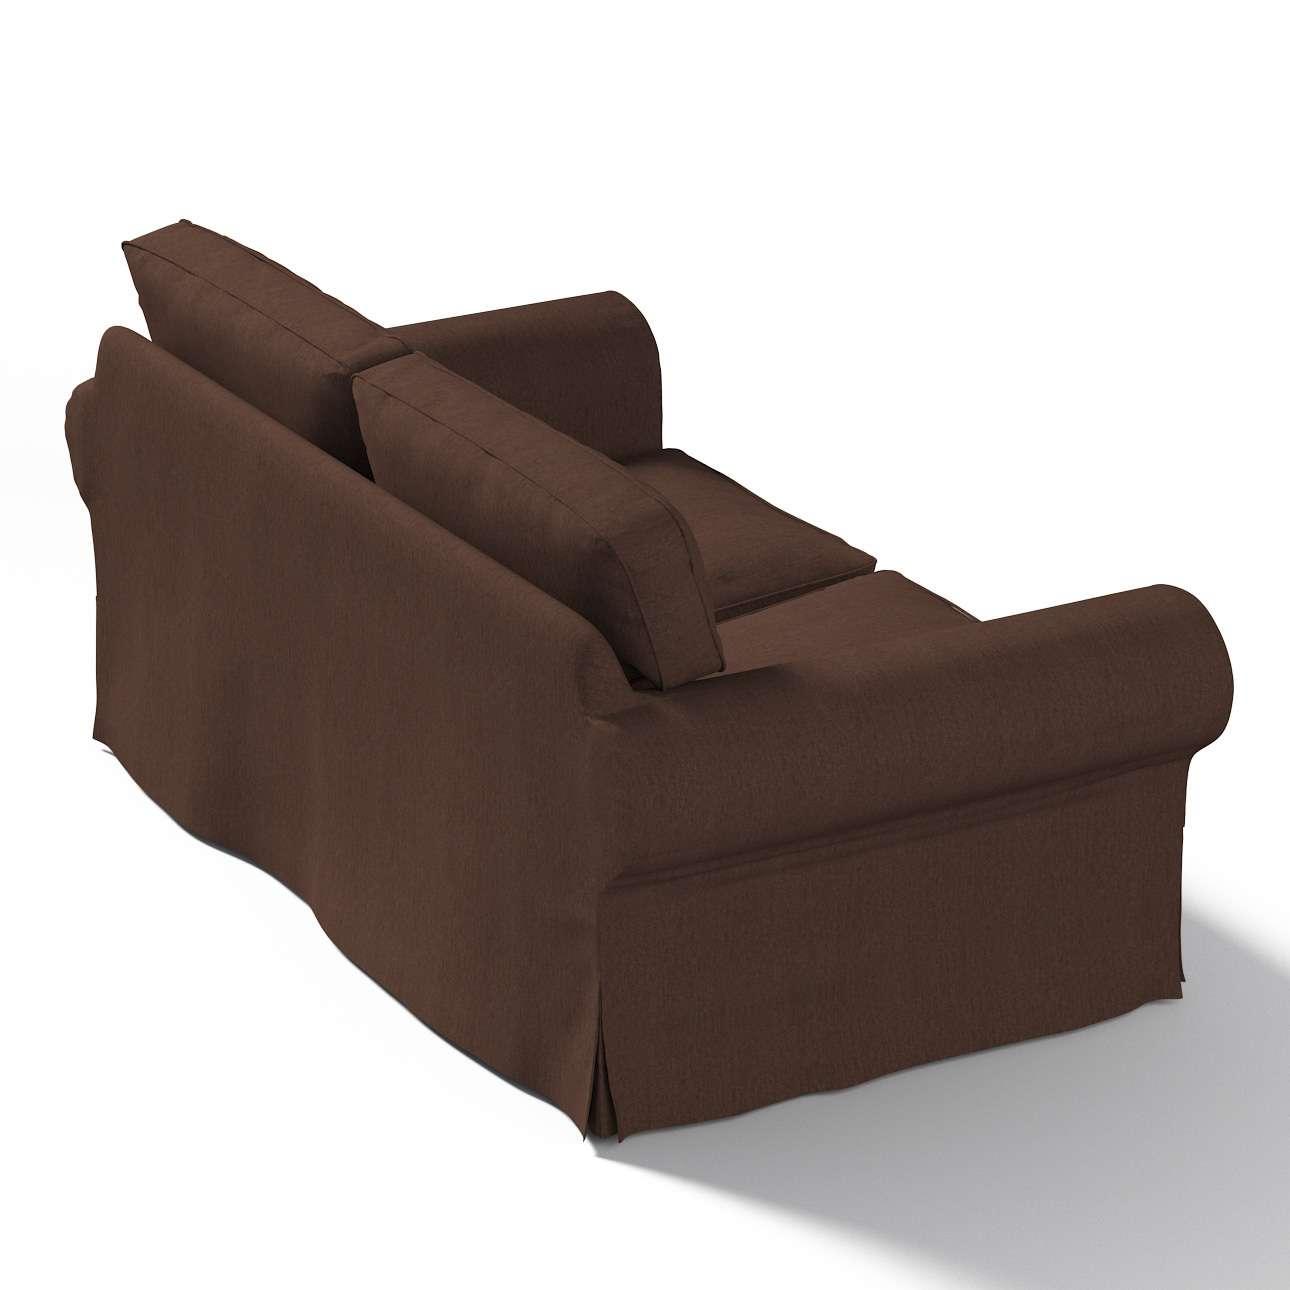 Ektorp 2-Sitzer Schlafsofabezug  ALTES Modell Sofabezug Ektorp 2-Sitzer Schlafsofa altes Modell von der Kollektion Chenille , Stoff: 702-18